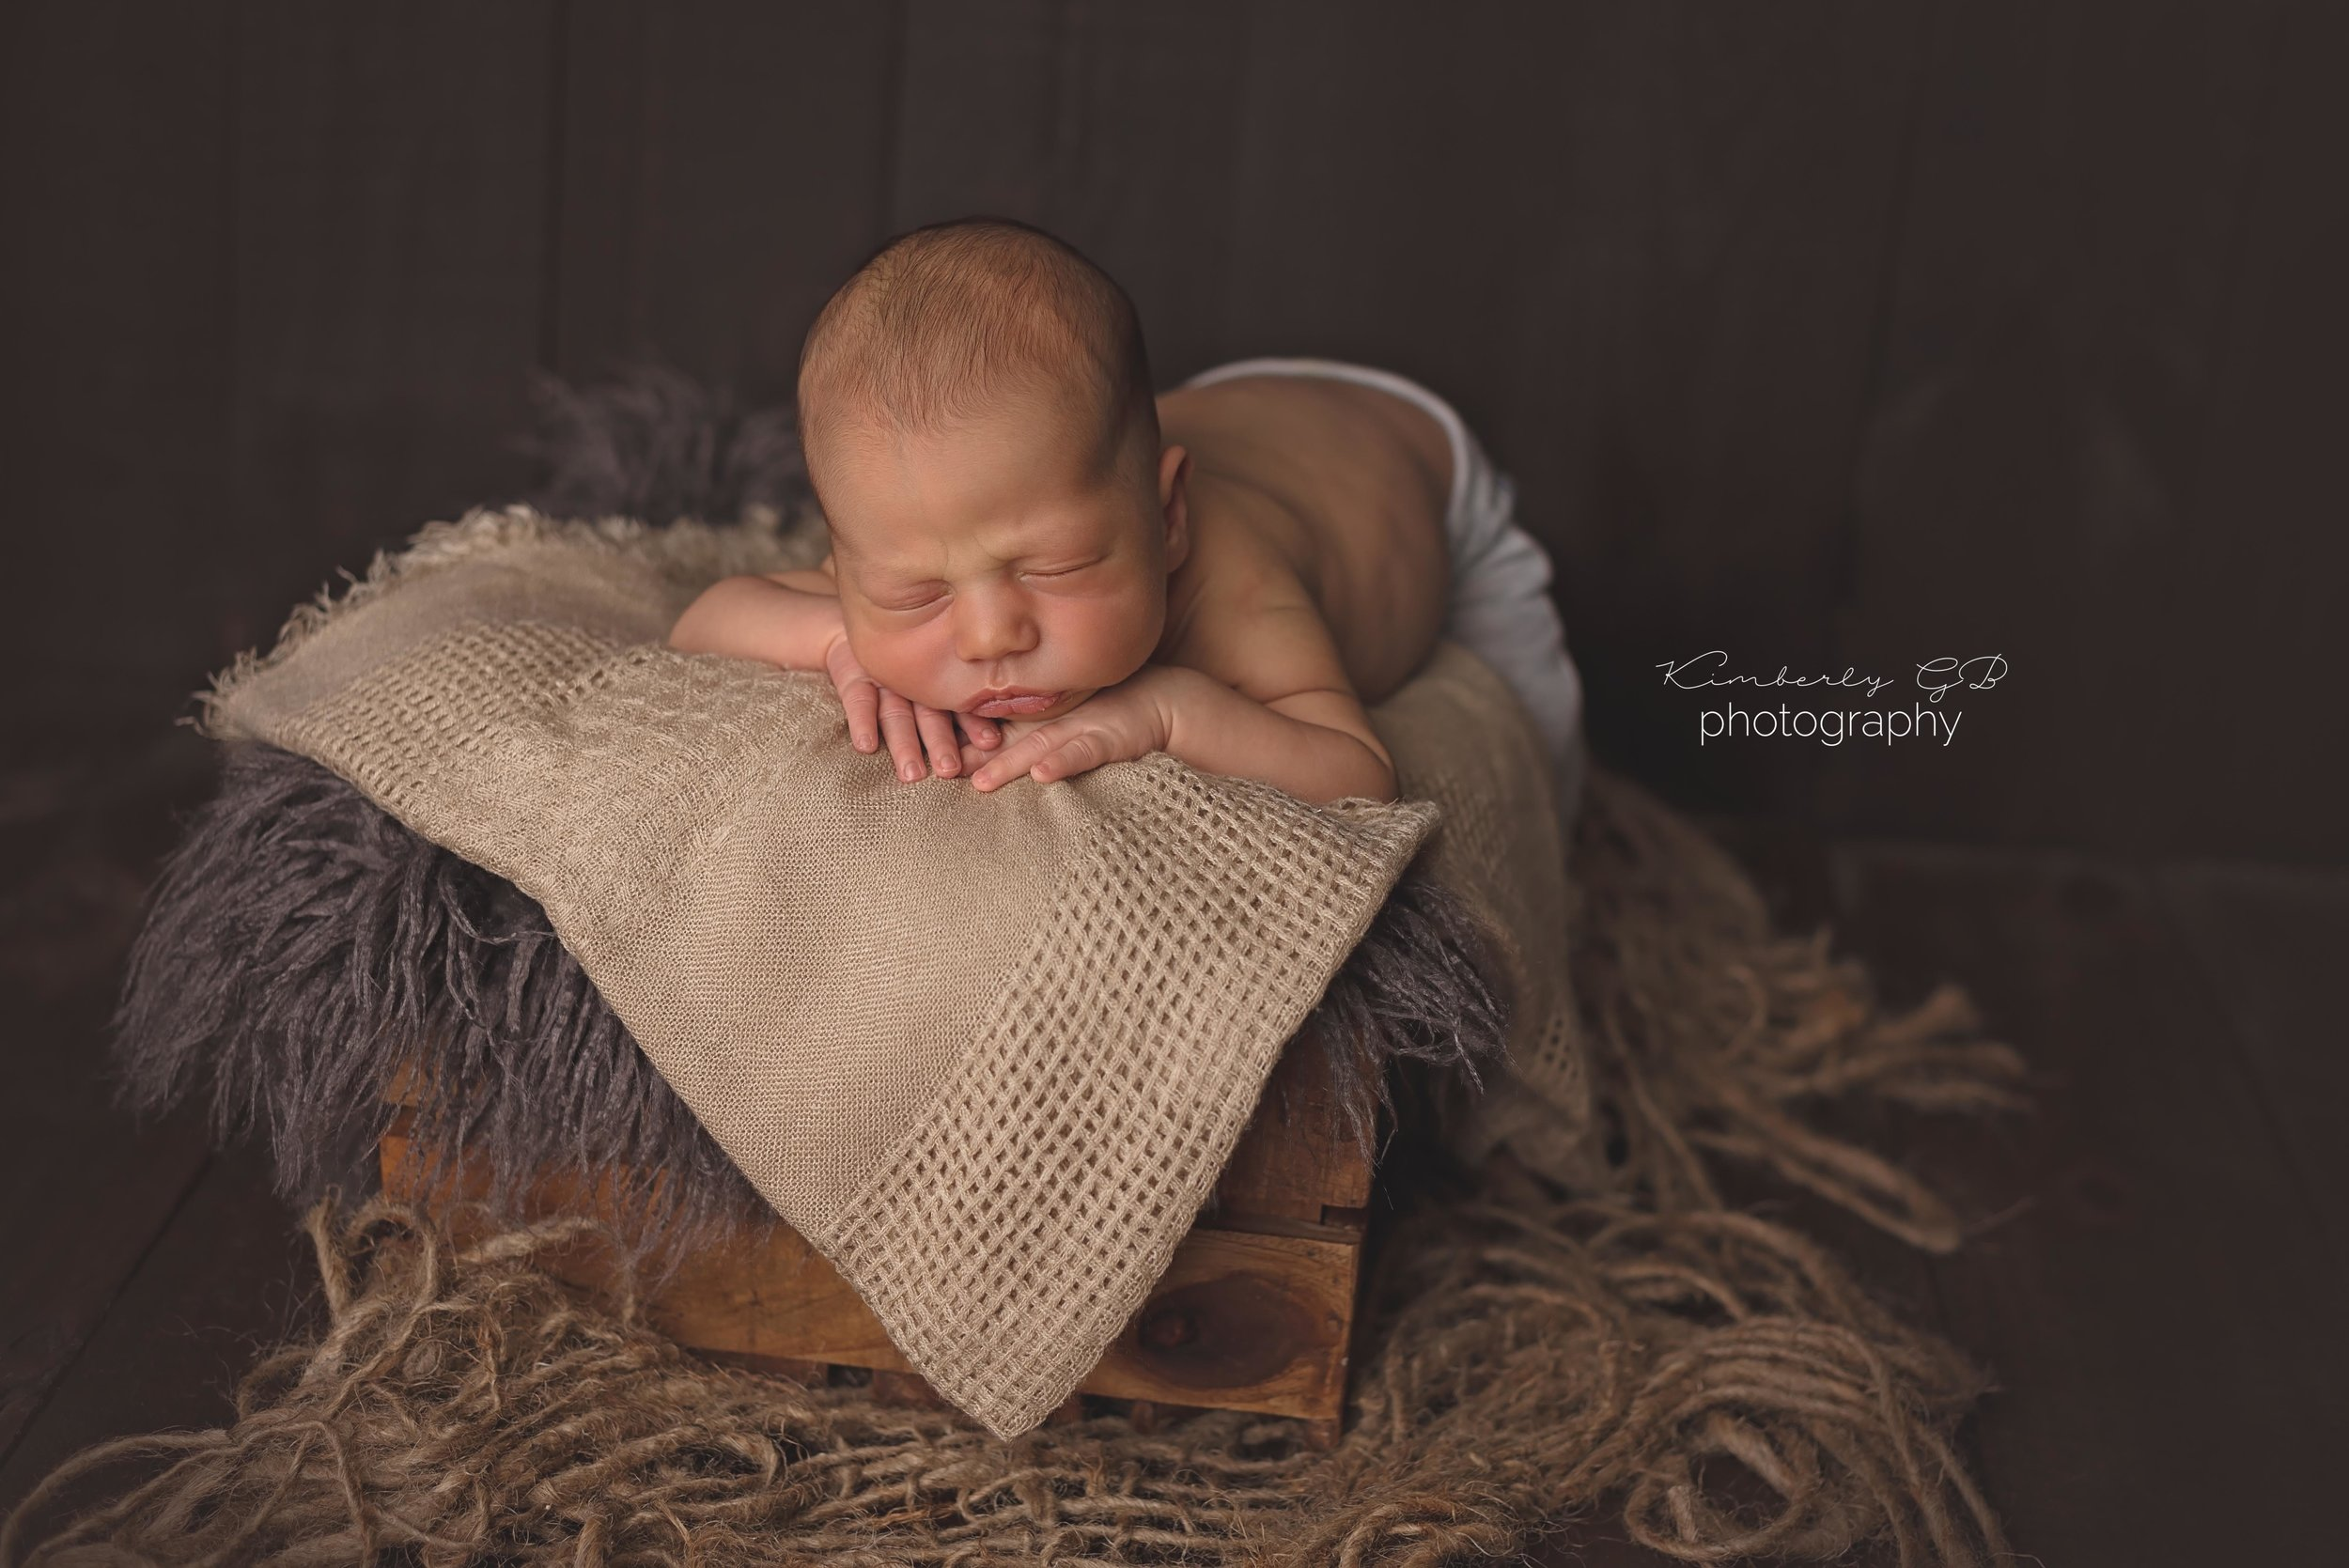 fotografia-de-recien-nacidos-bebes-newborn-en-puerto-rico-kimberly-gb-photography-fotografa-99.jpg